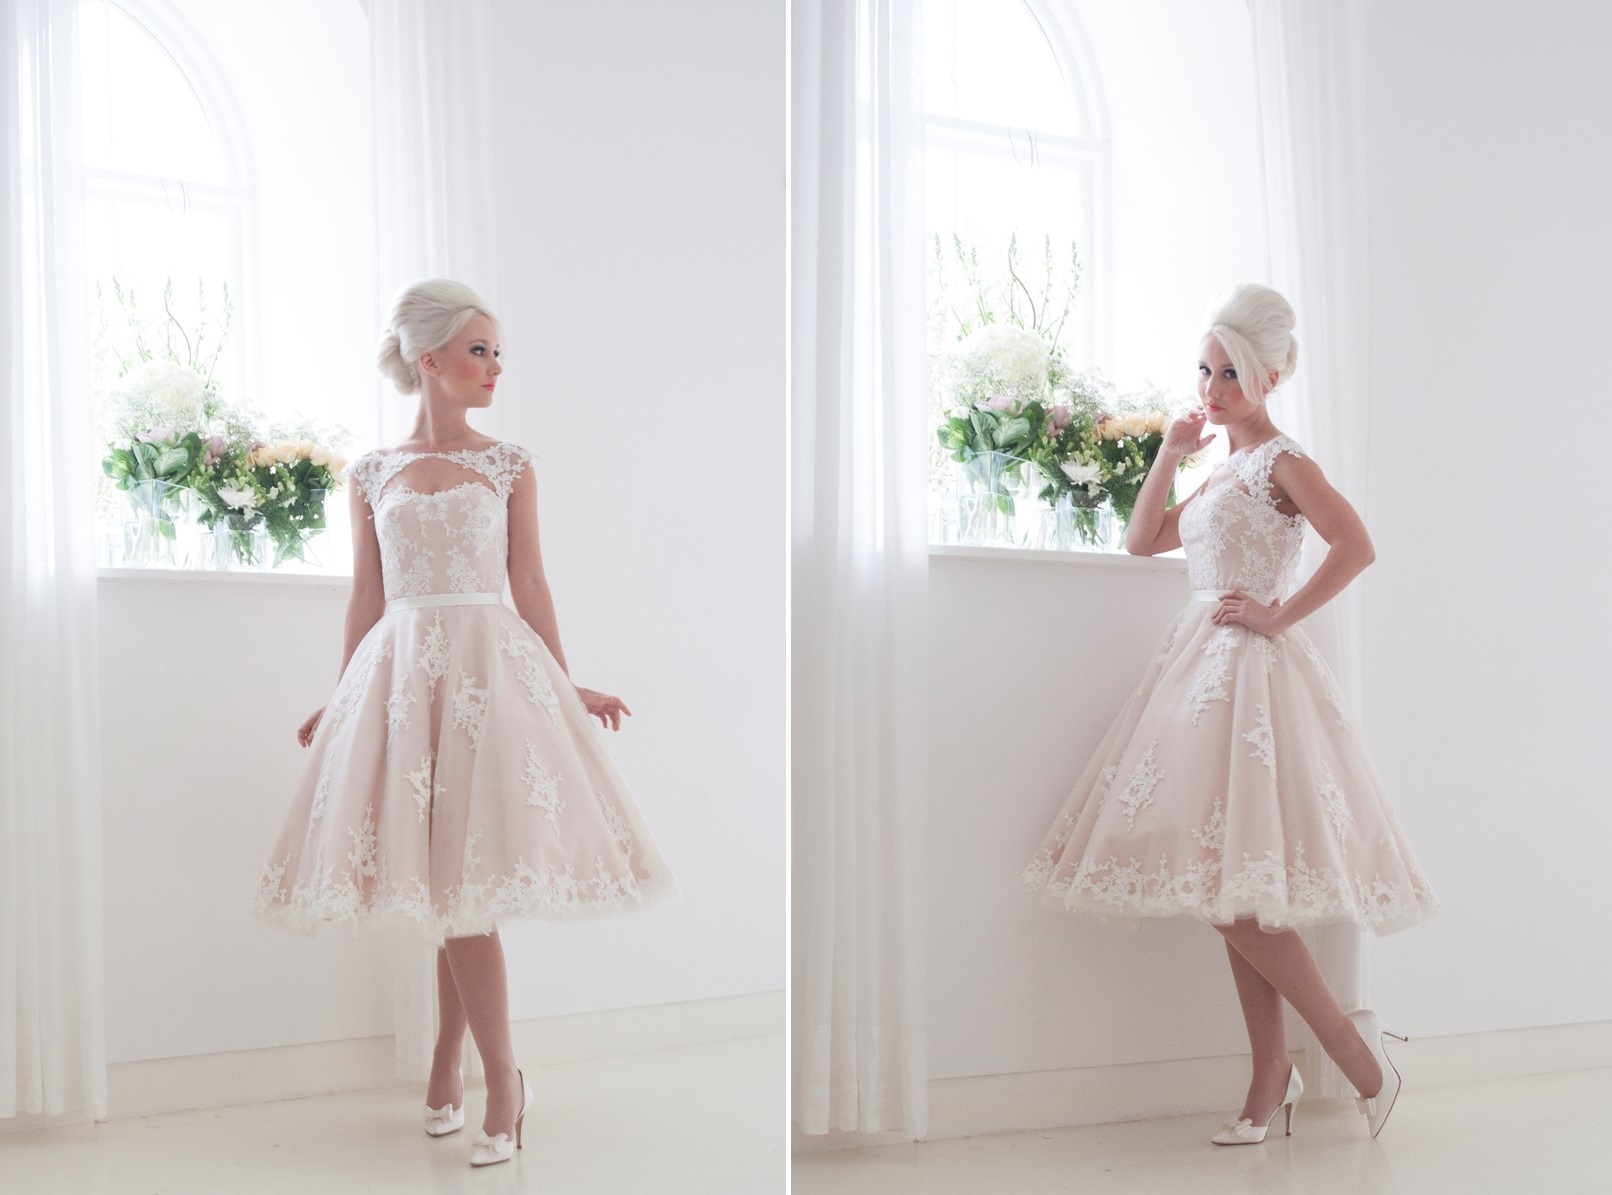 Leonora - Tea Length Wedding Dress from House of Mooshki's 2016 Bridal Collection